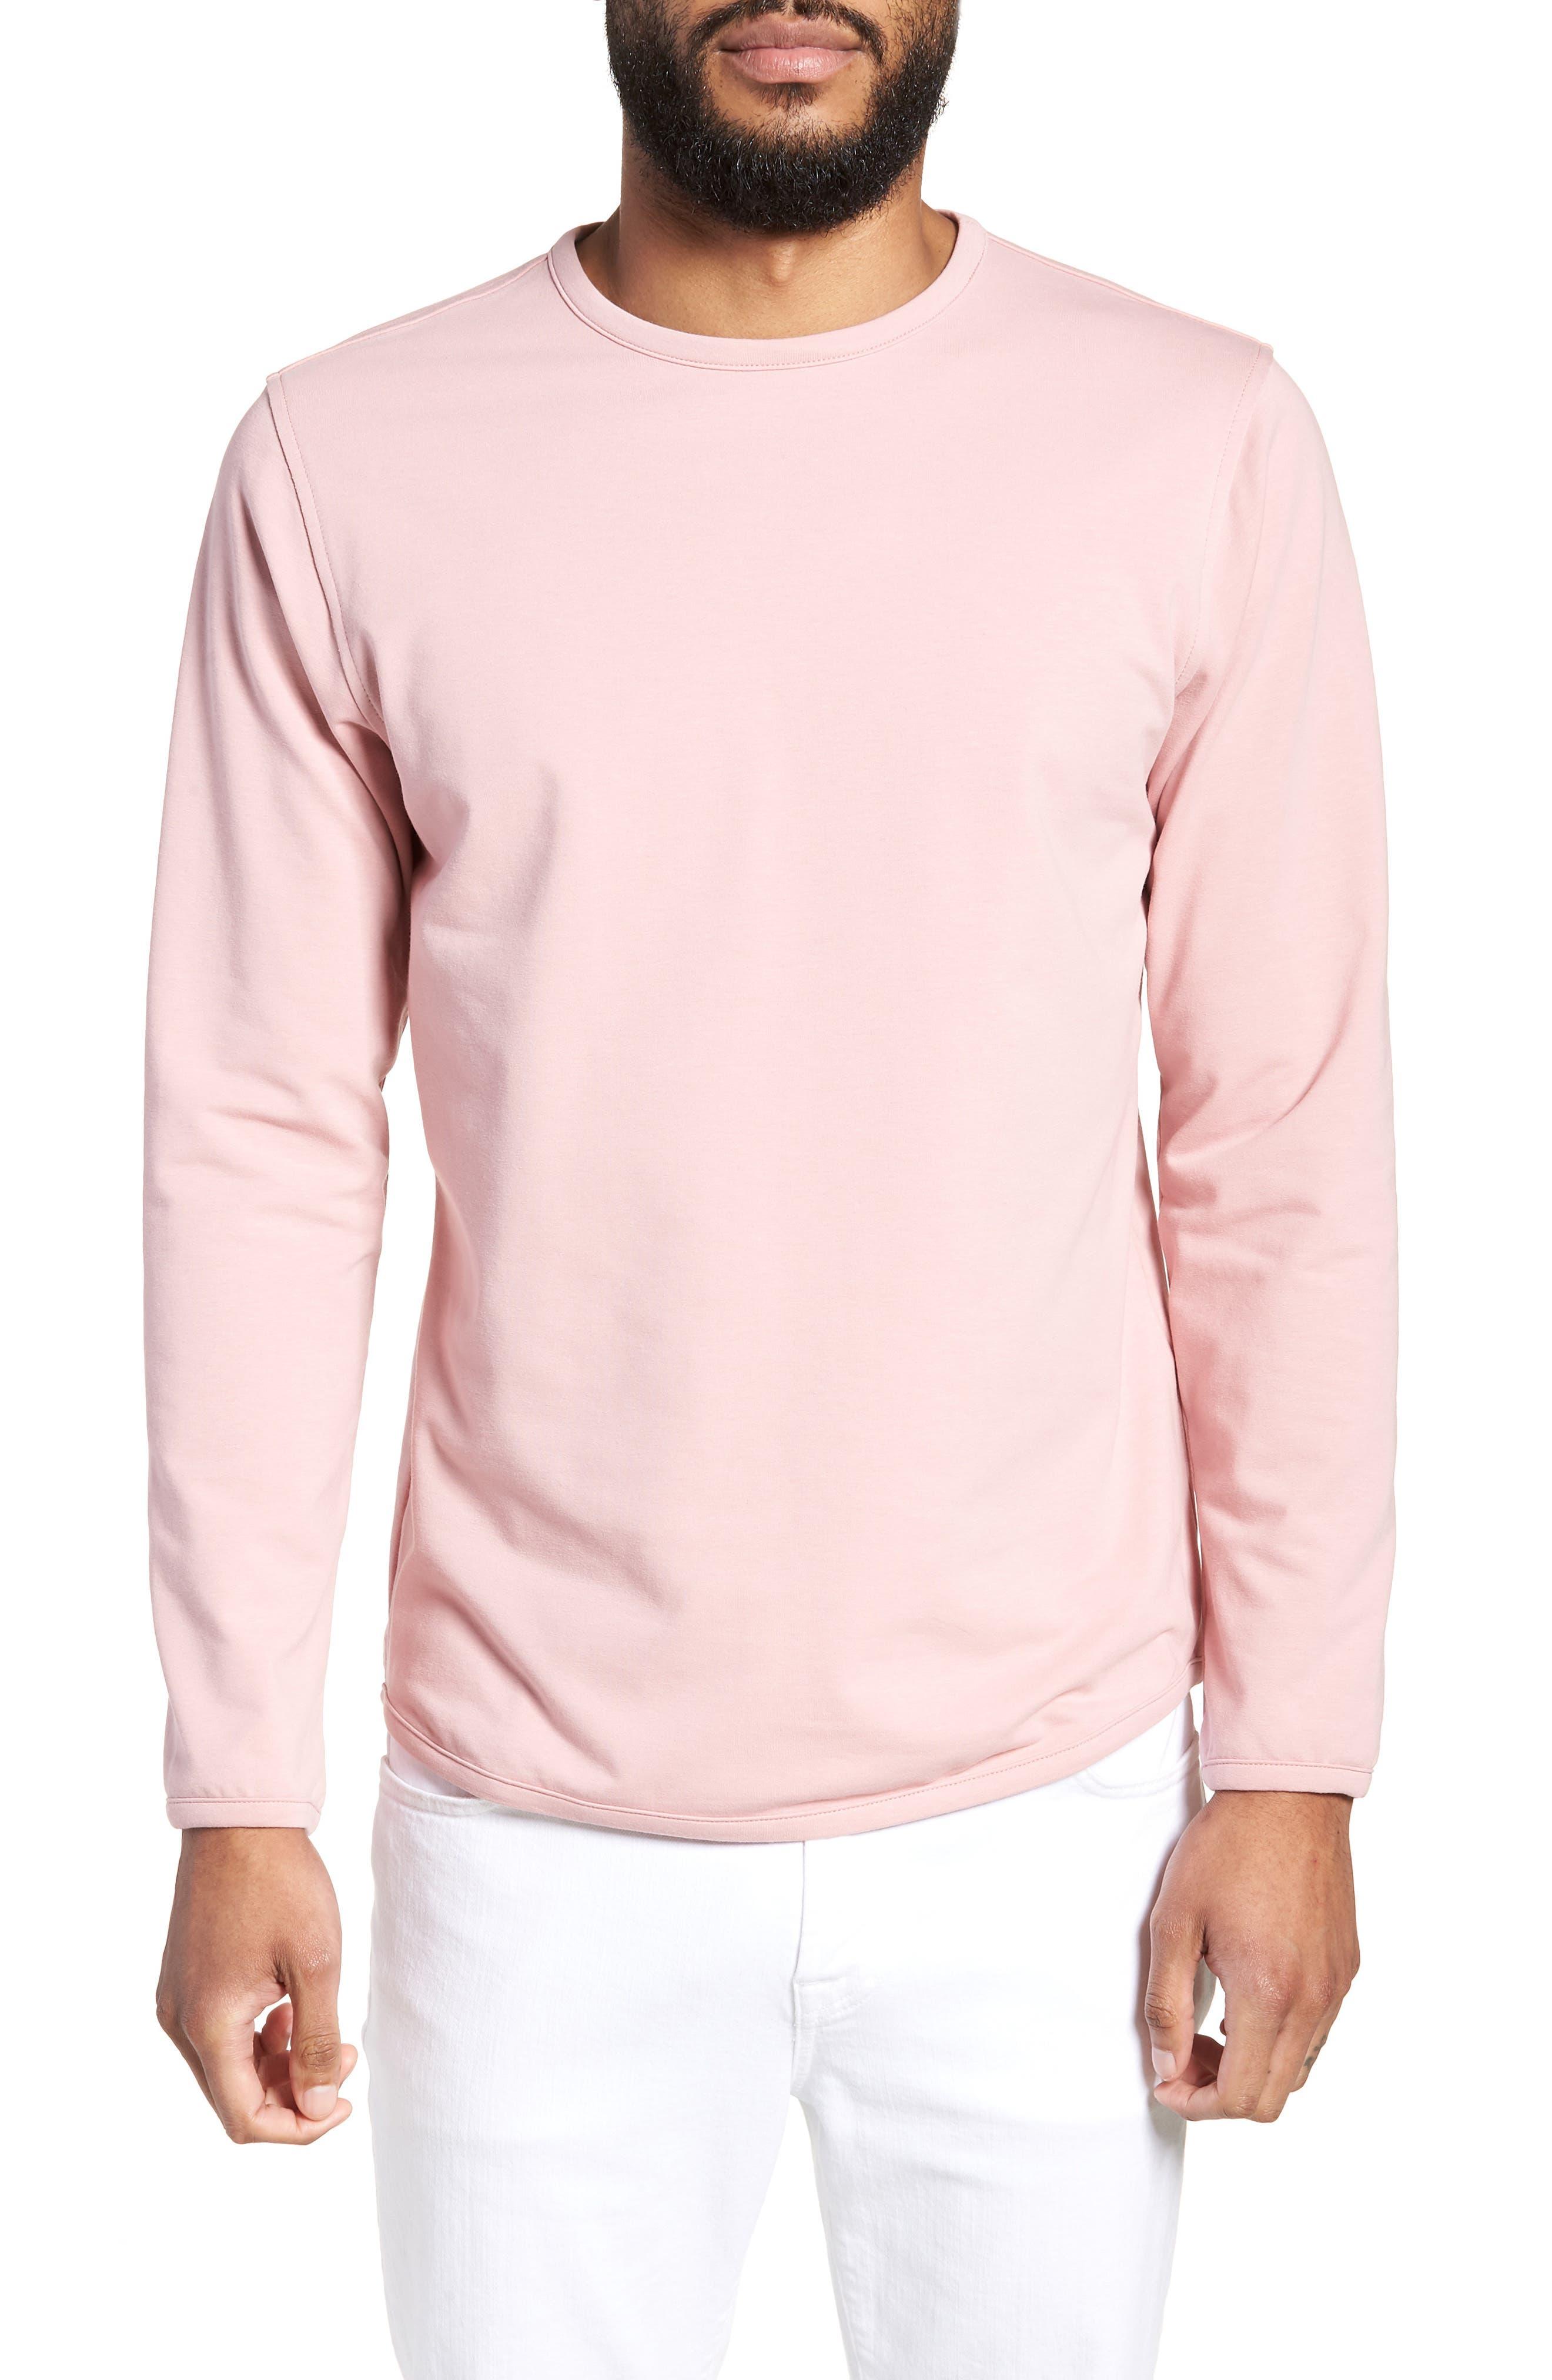 Alternate Image 1 Selected - TWENTYMETRICTONS Trim Fit Long Sleeve T-Shirt